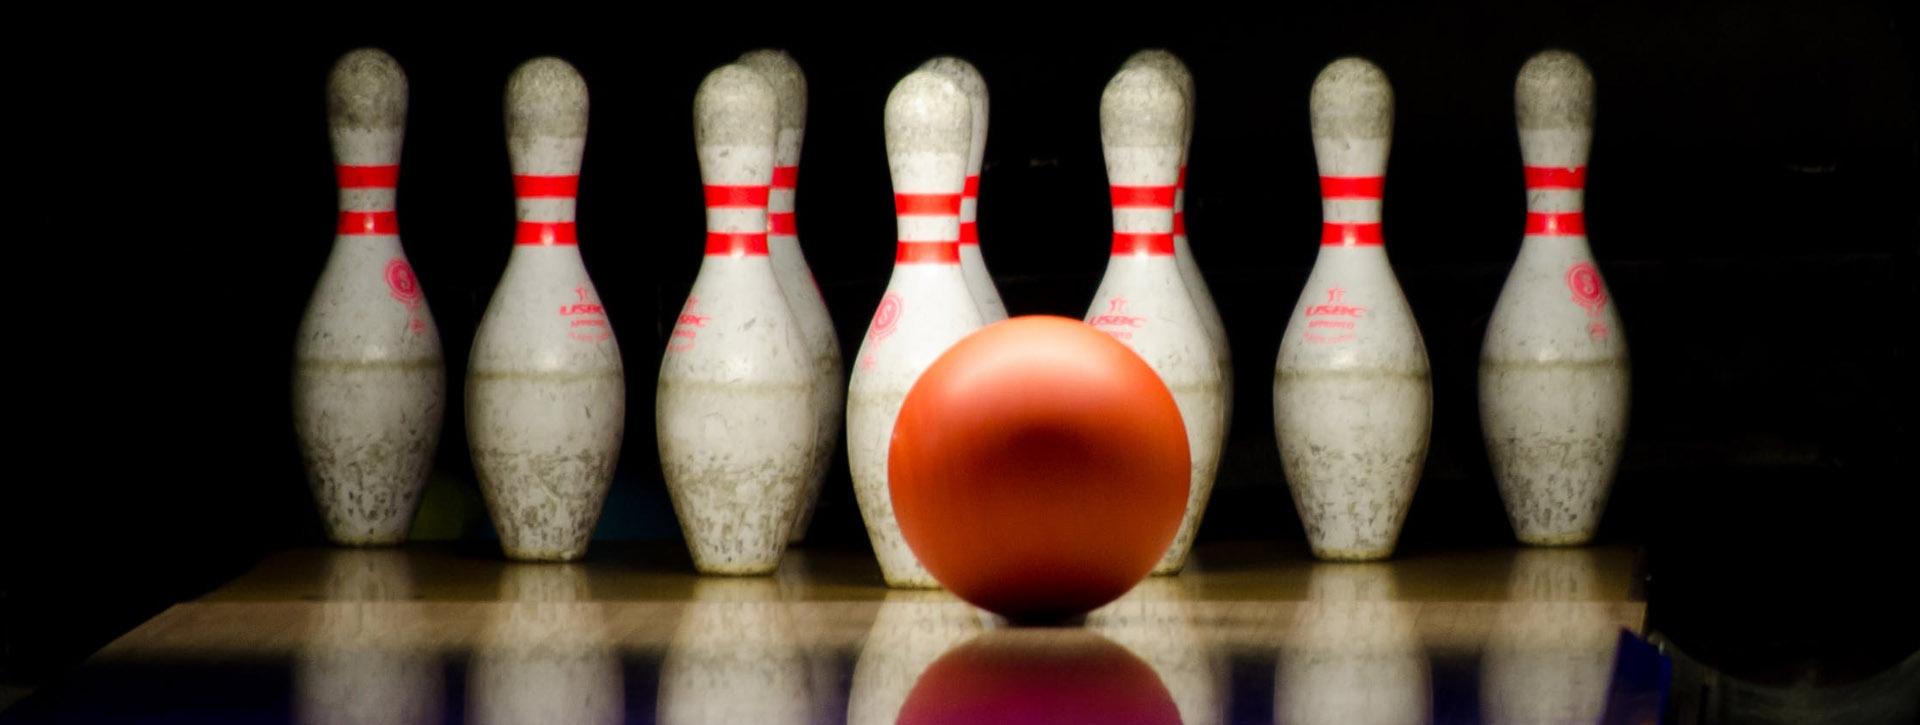 Bowlingklubben BK Style